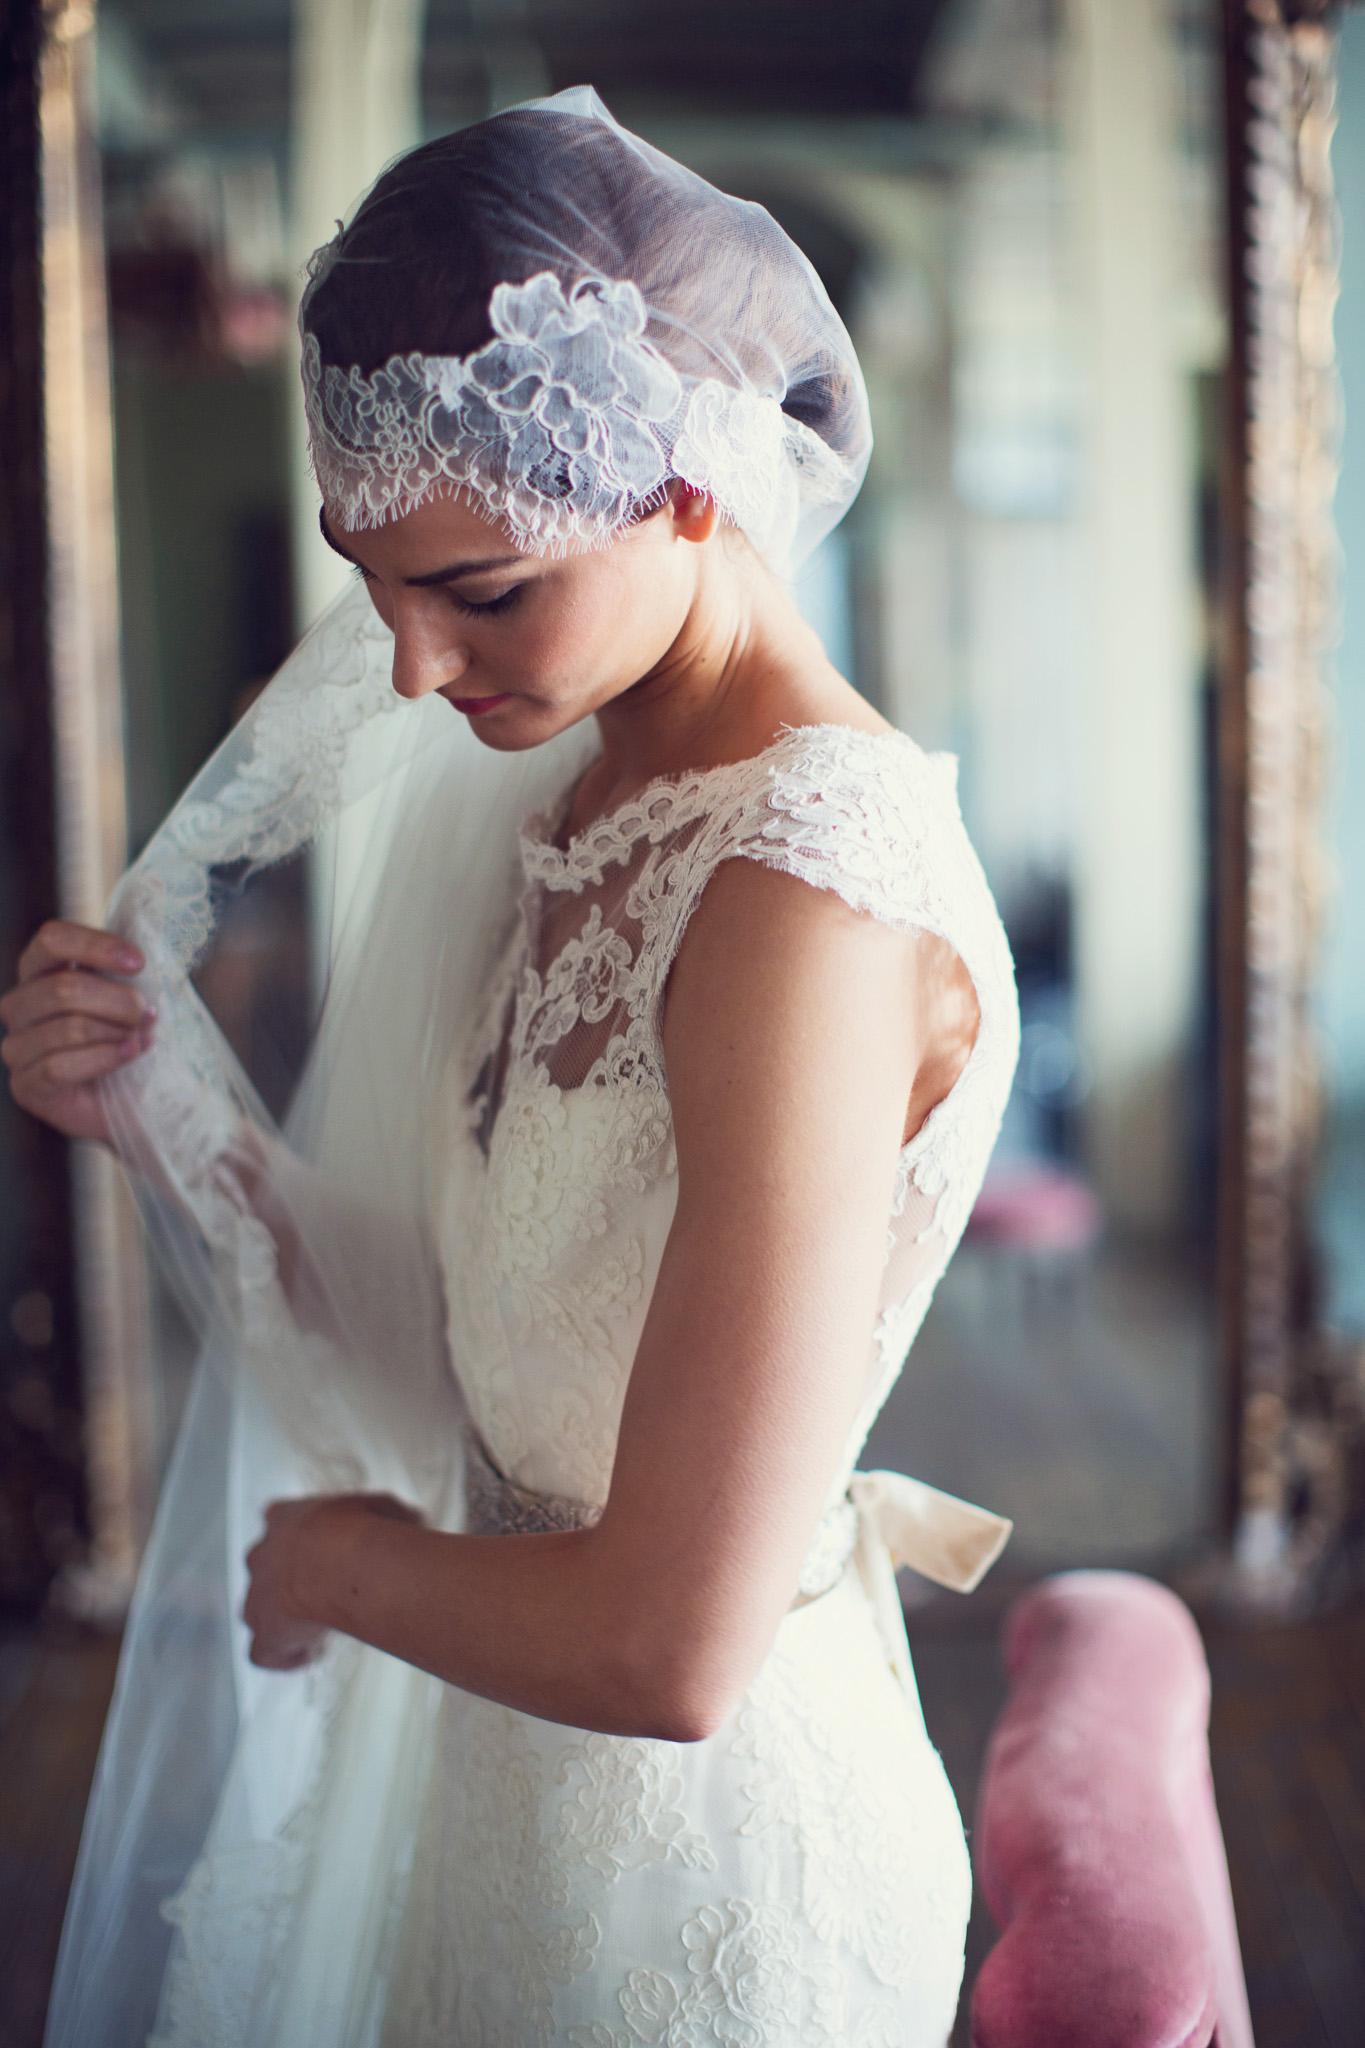 boho-bride-headpiece-lace-dress-veil